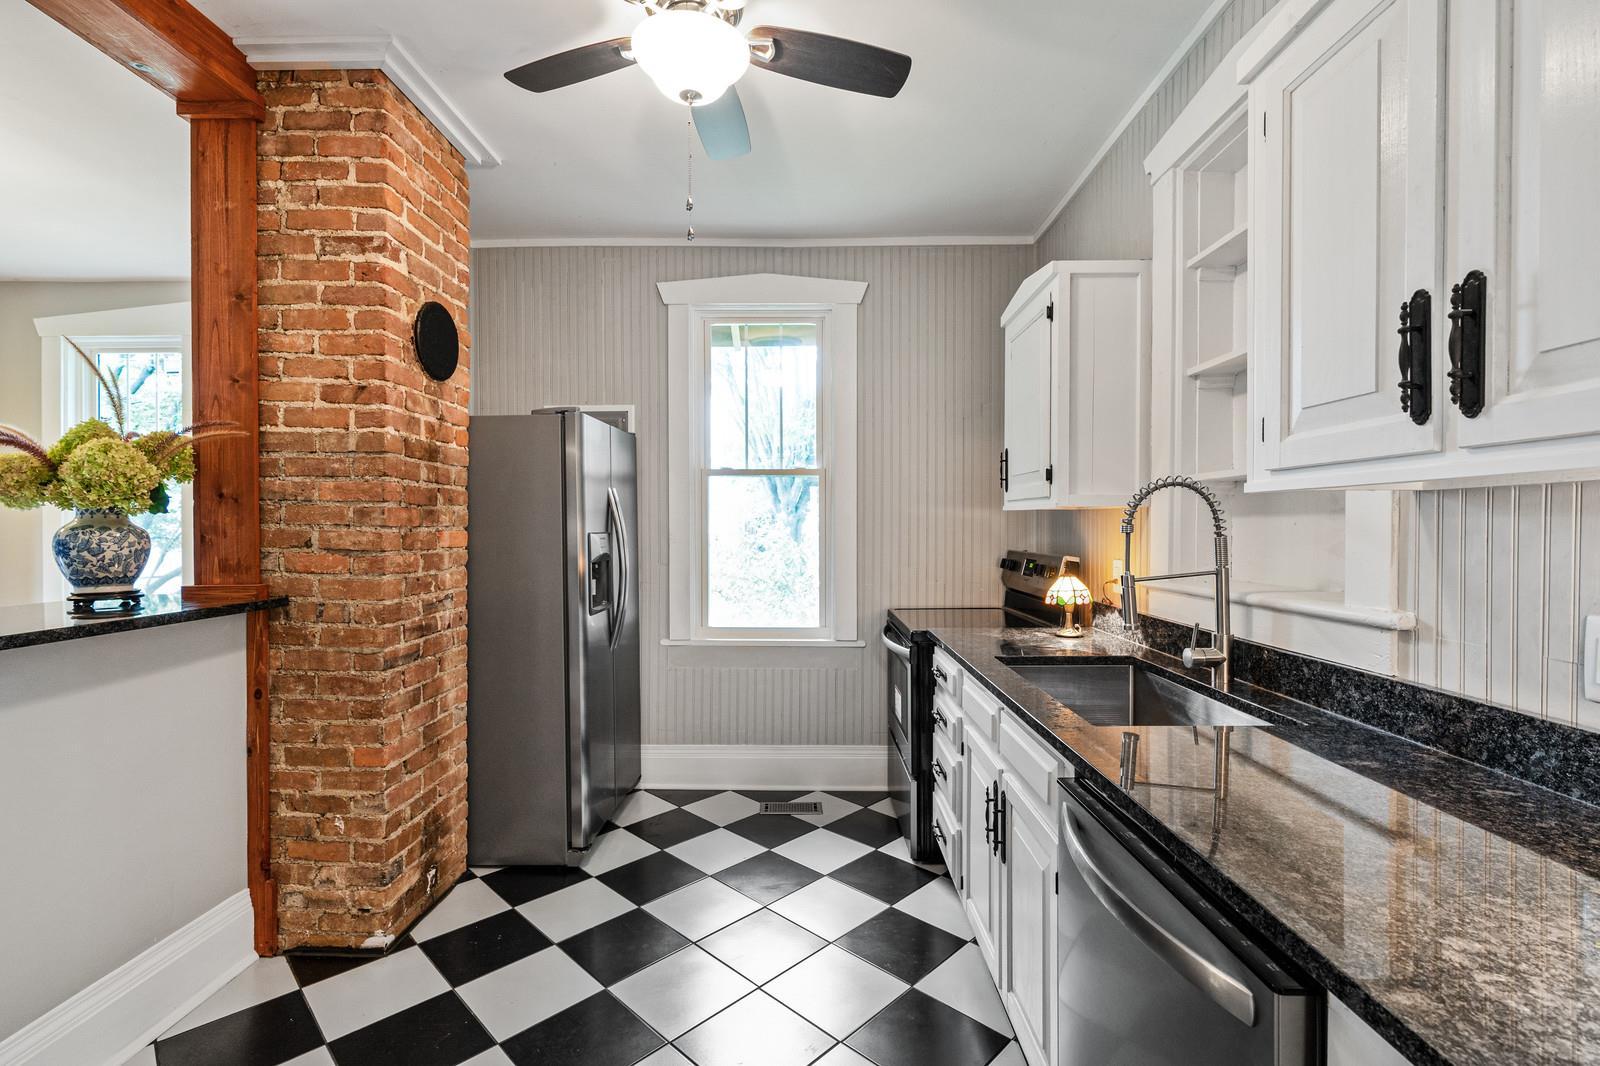 504 Boren St, Springfield, TN 37172 - Springfield, TN real estate listing